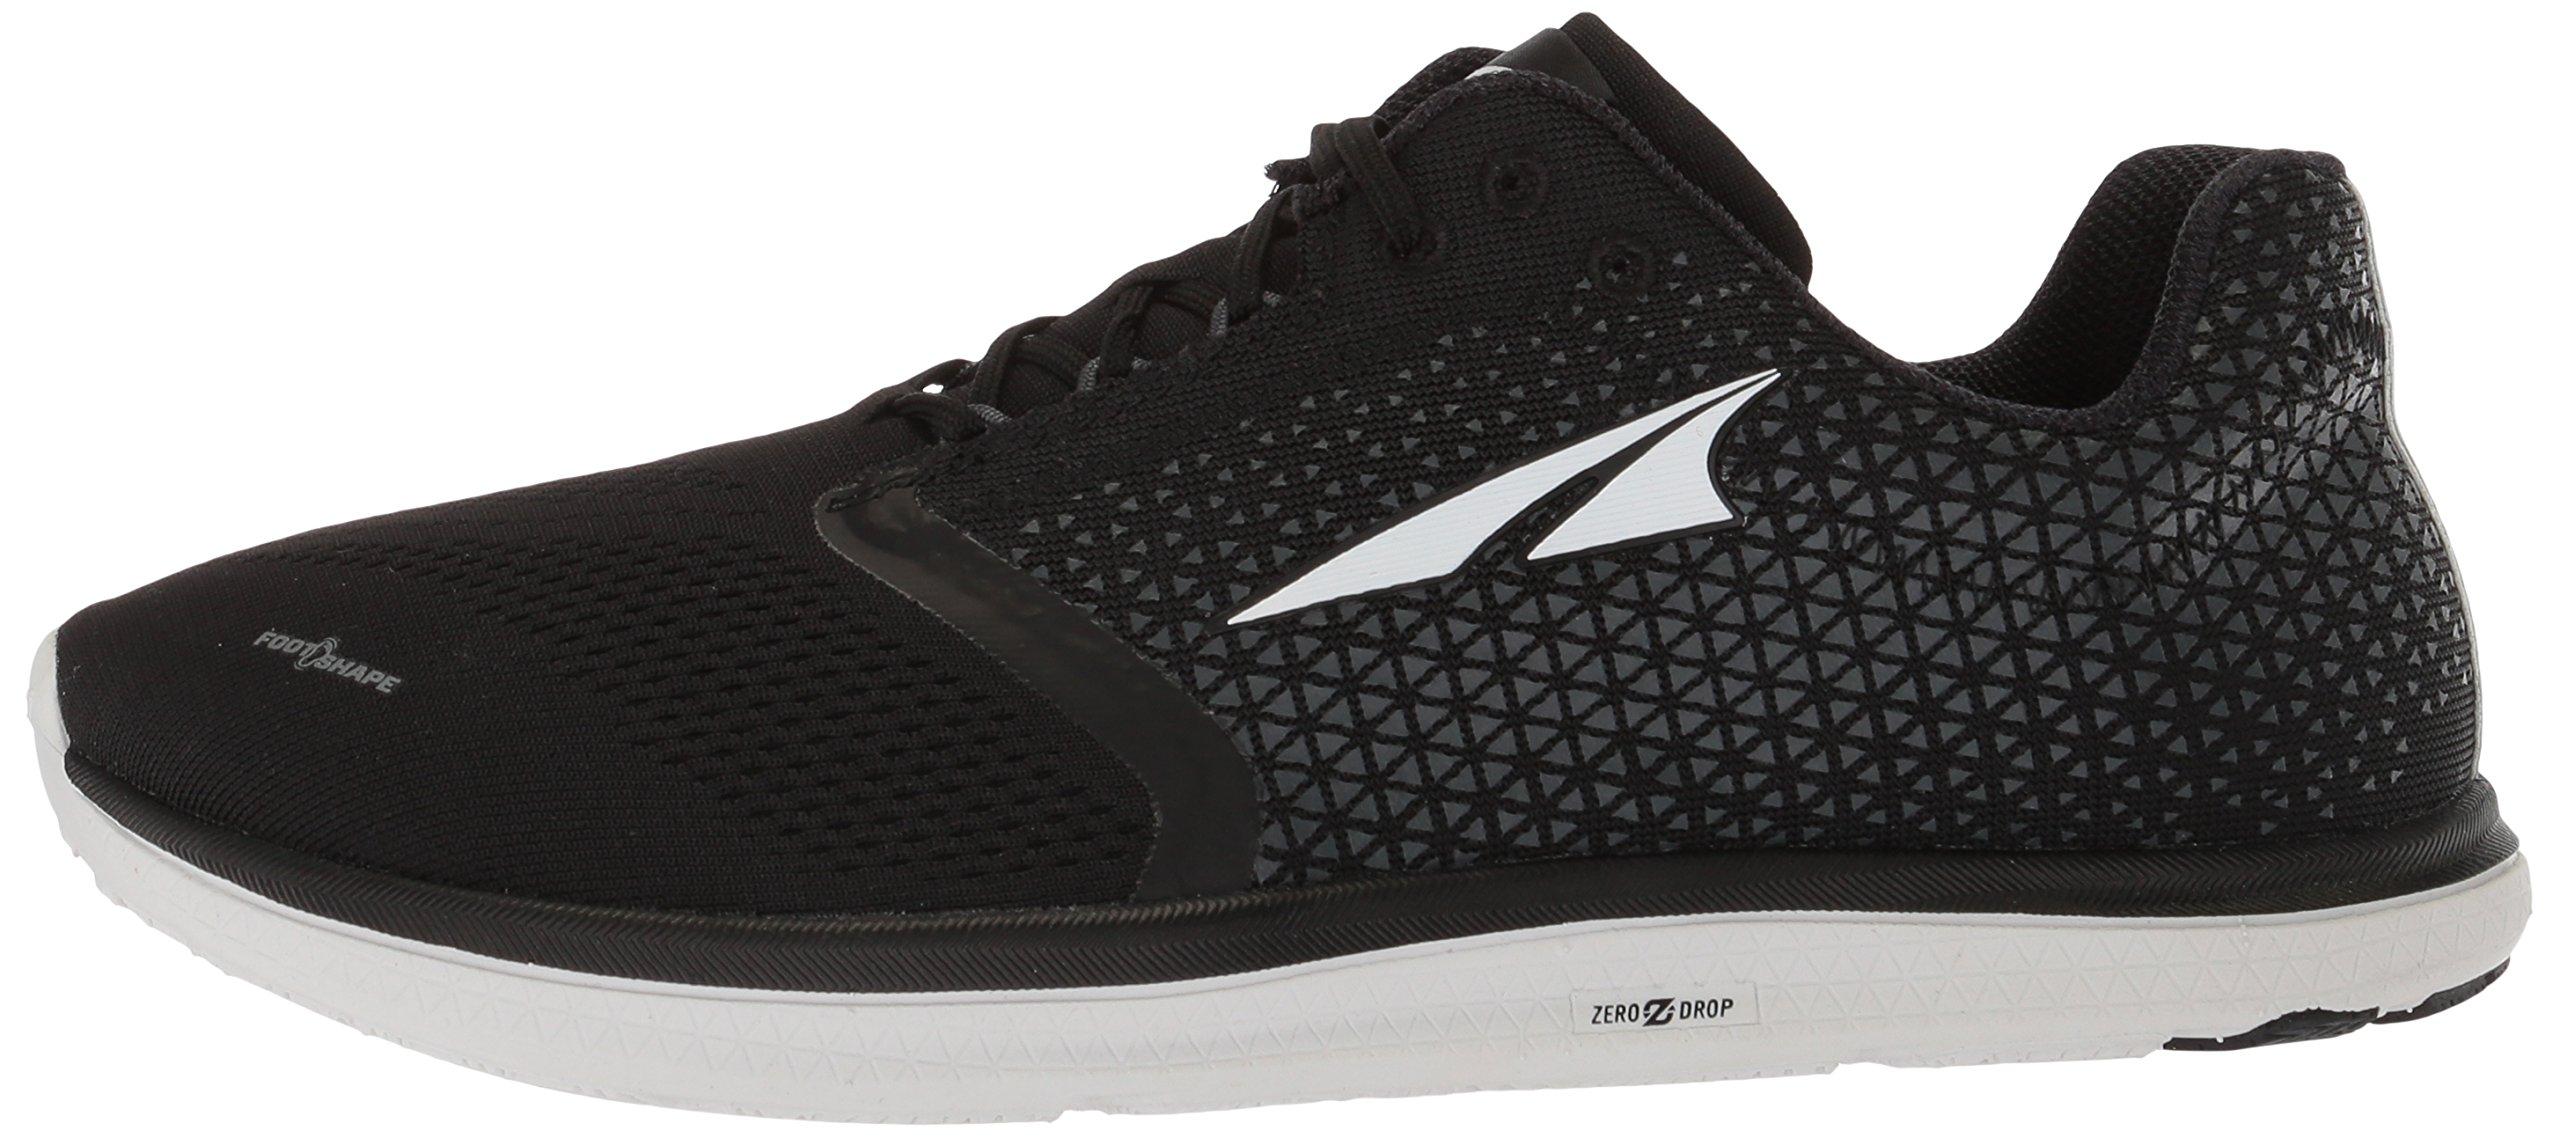 Altra Men's Solstice Sneaker Black 8.5 Regular US by Altra (Image #5)